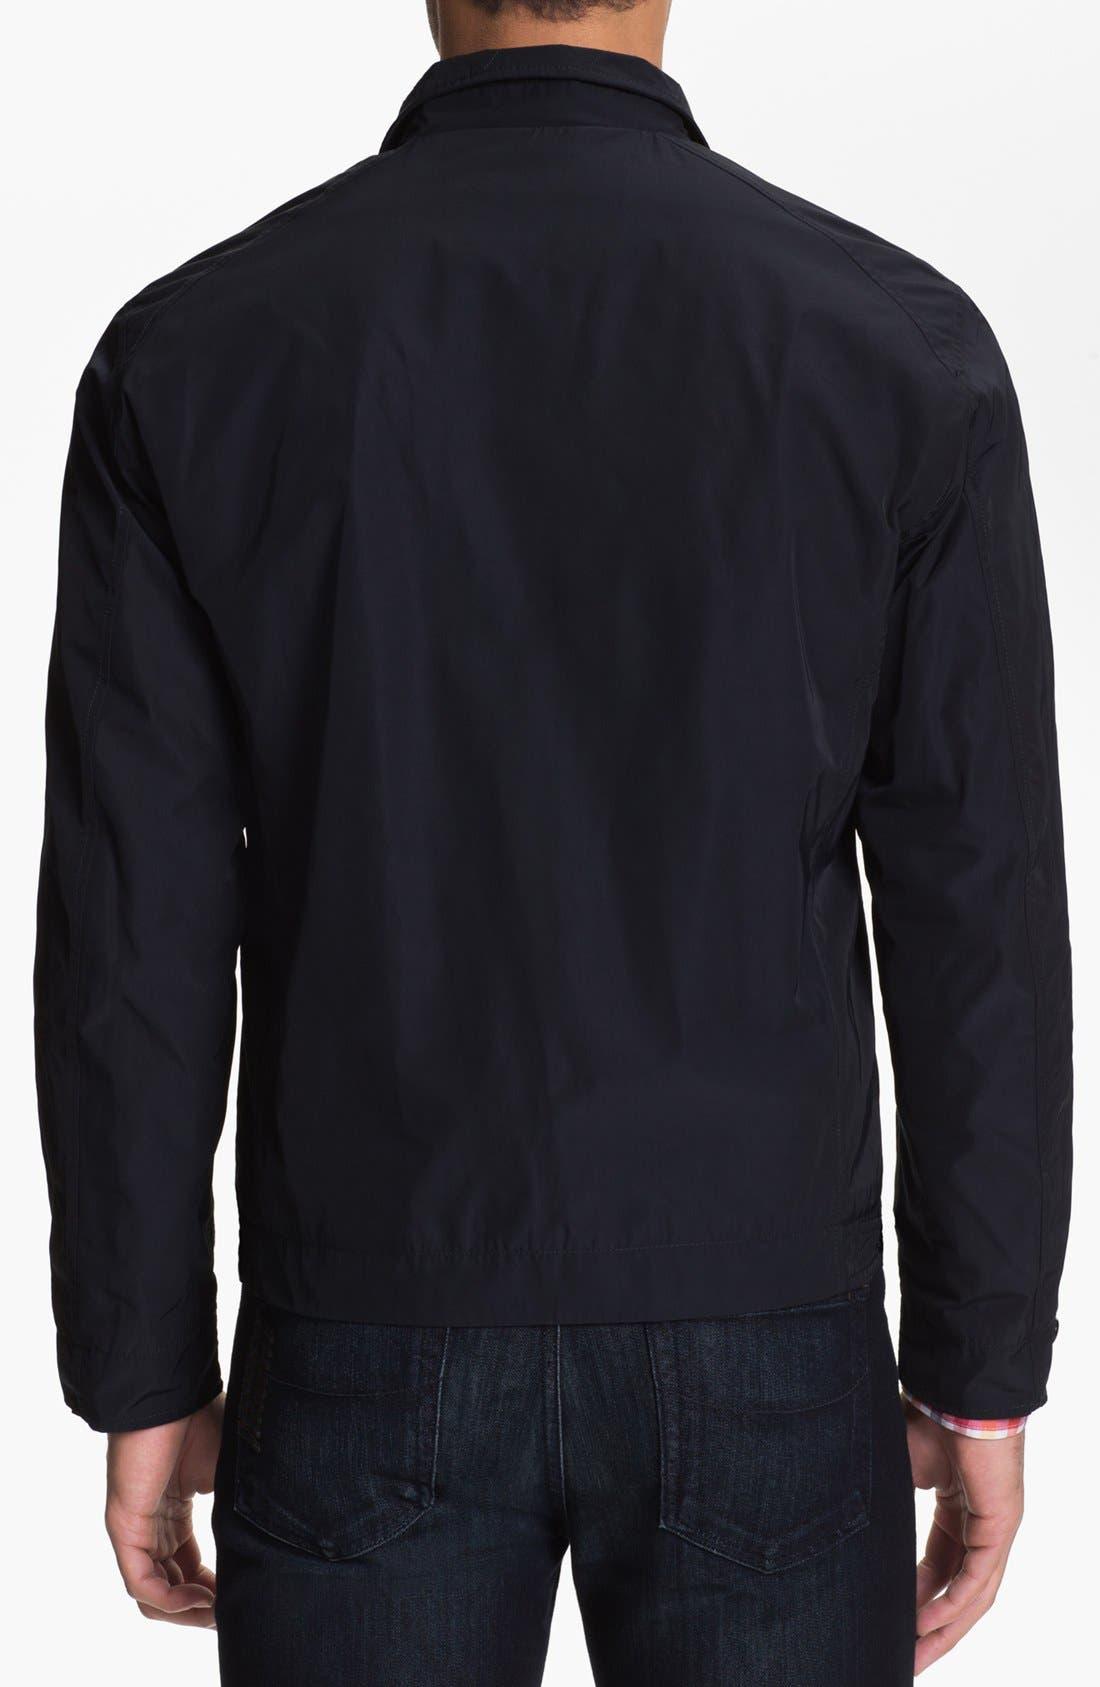 Alternate Image 2  - Façonnable Open Bottom Jacket (Big & Tall)